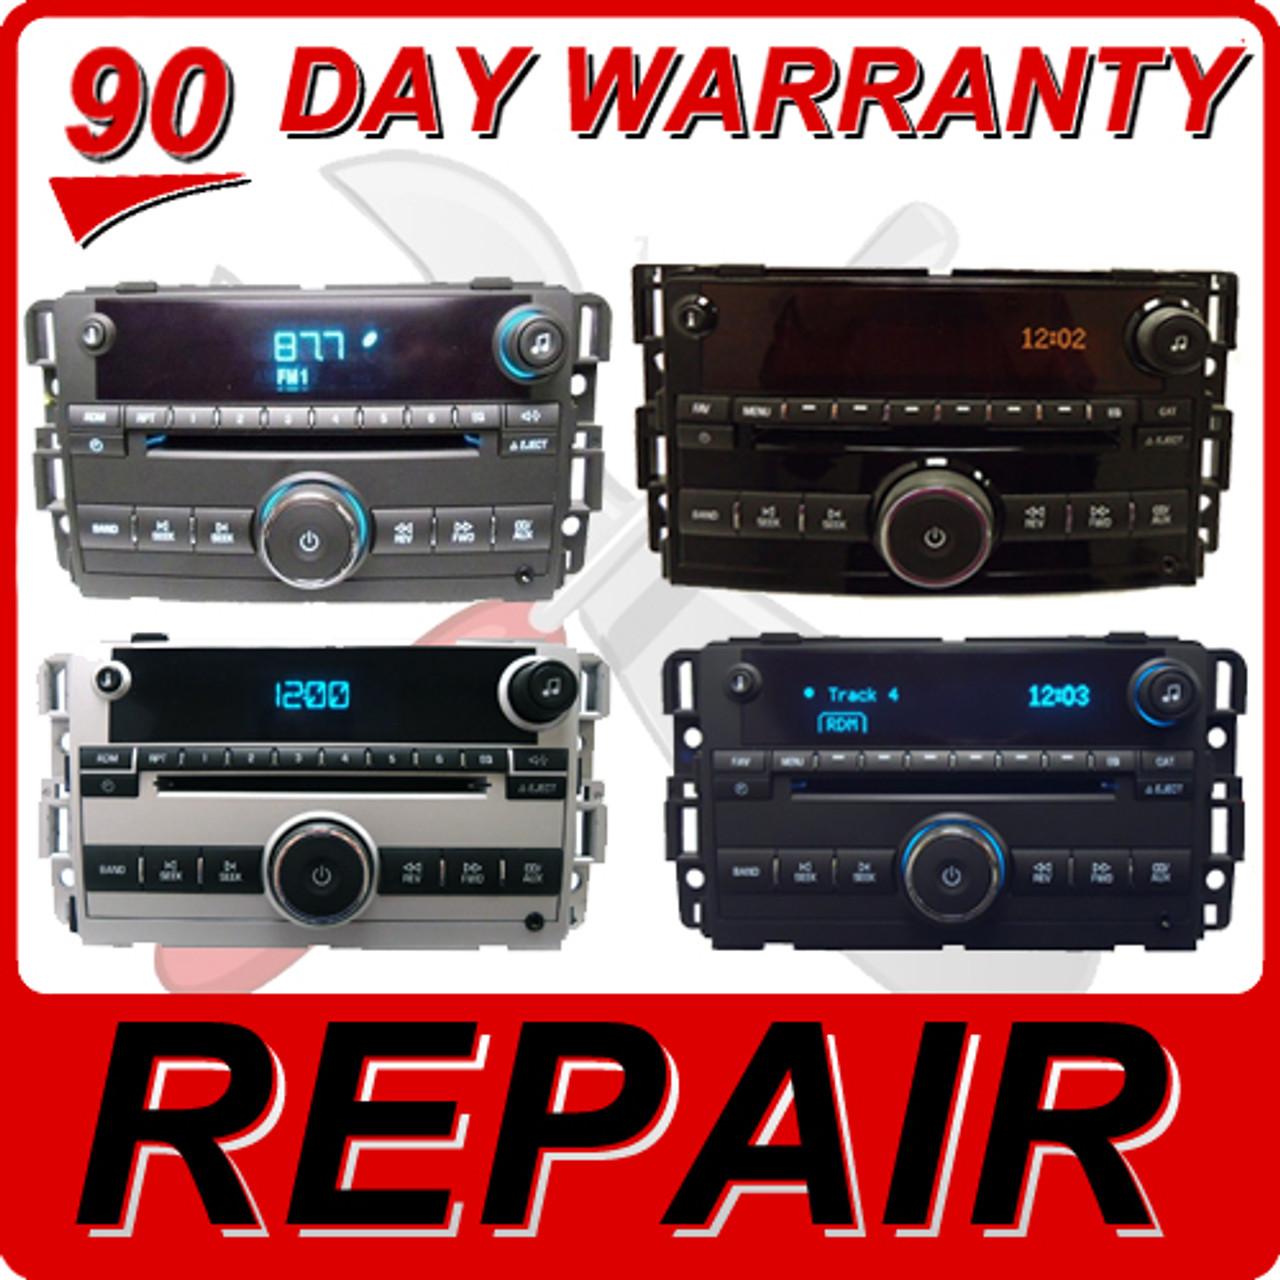 REPAIR 07 - 12 GMC Sierra Chevy Tahoe Single CD Player FIX